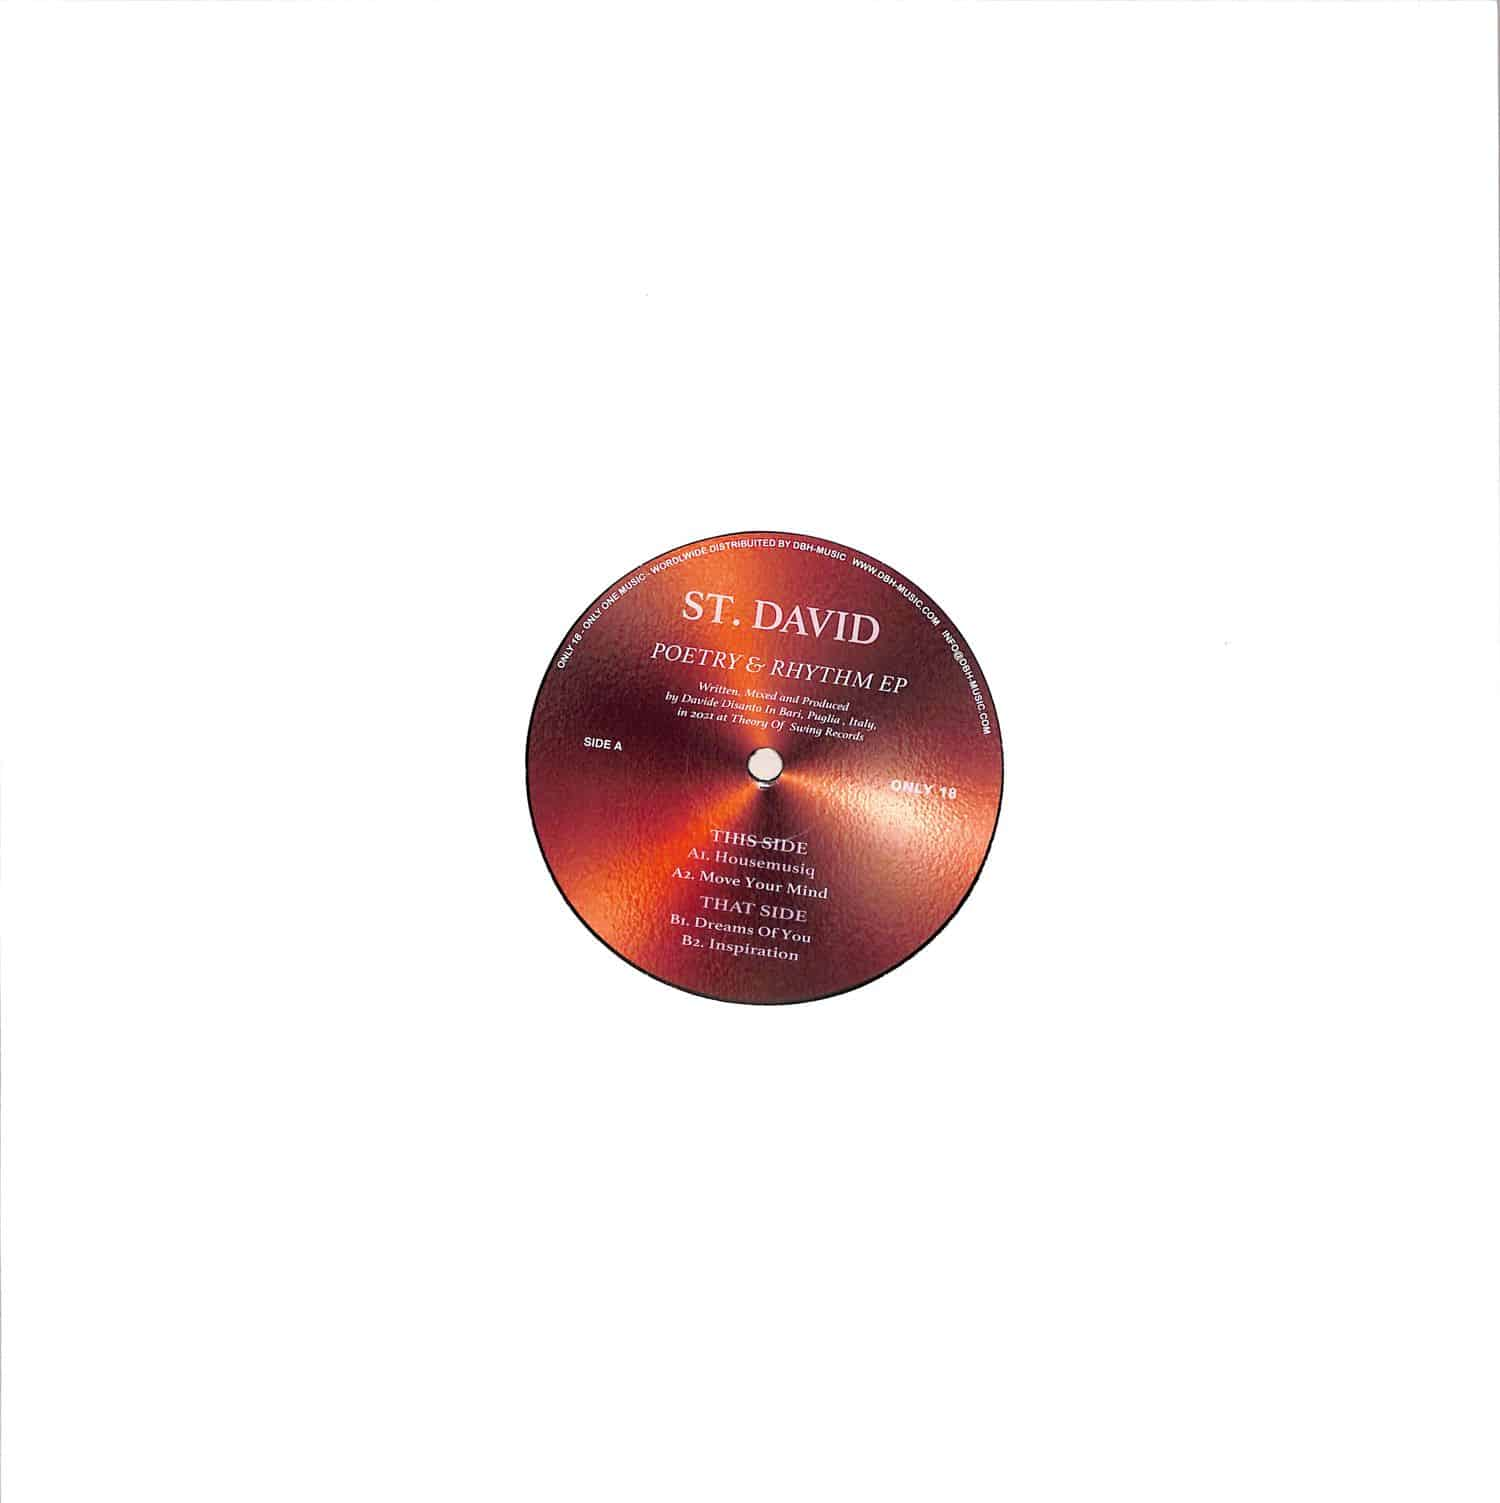 St. David - POETRY & RHYTHM EP